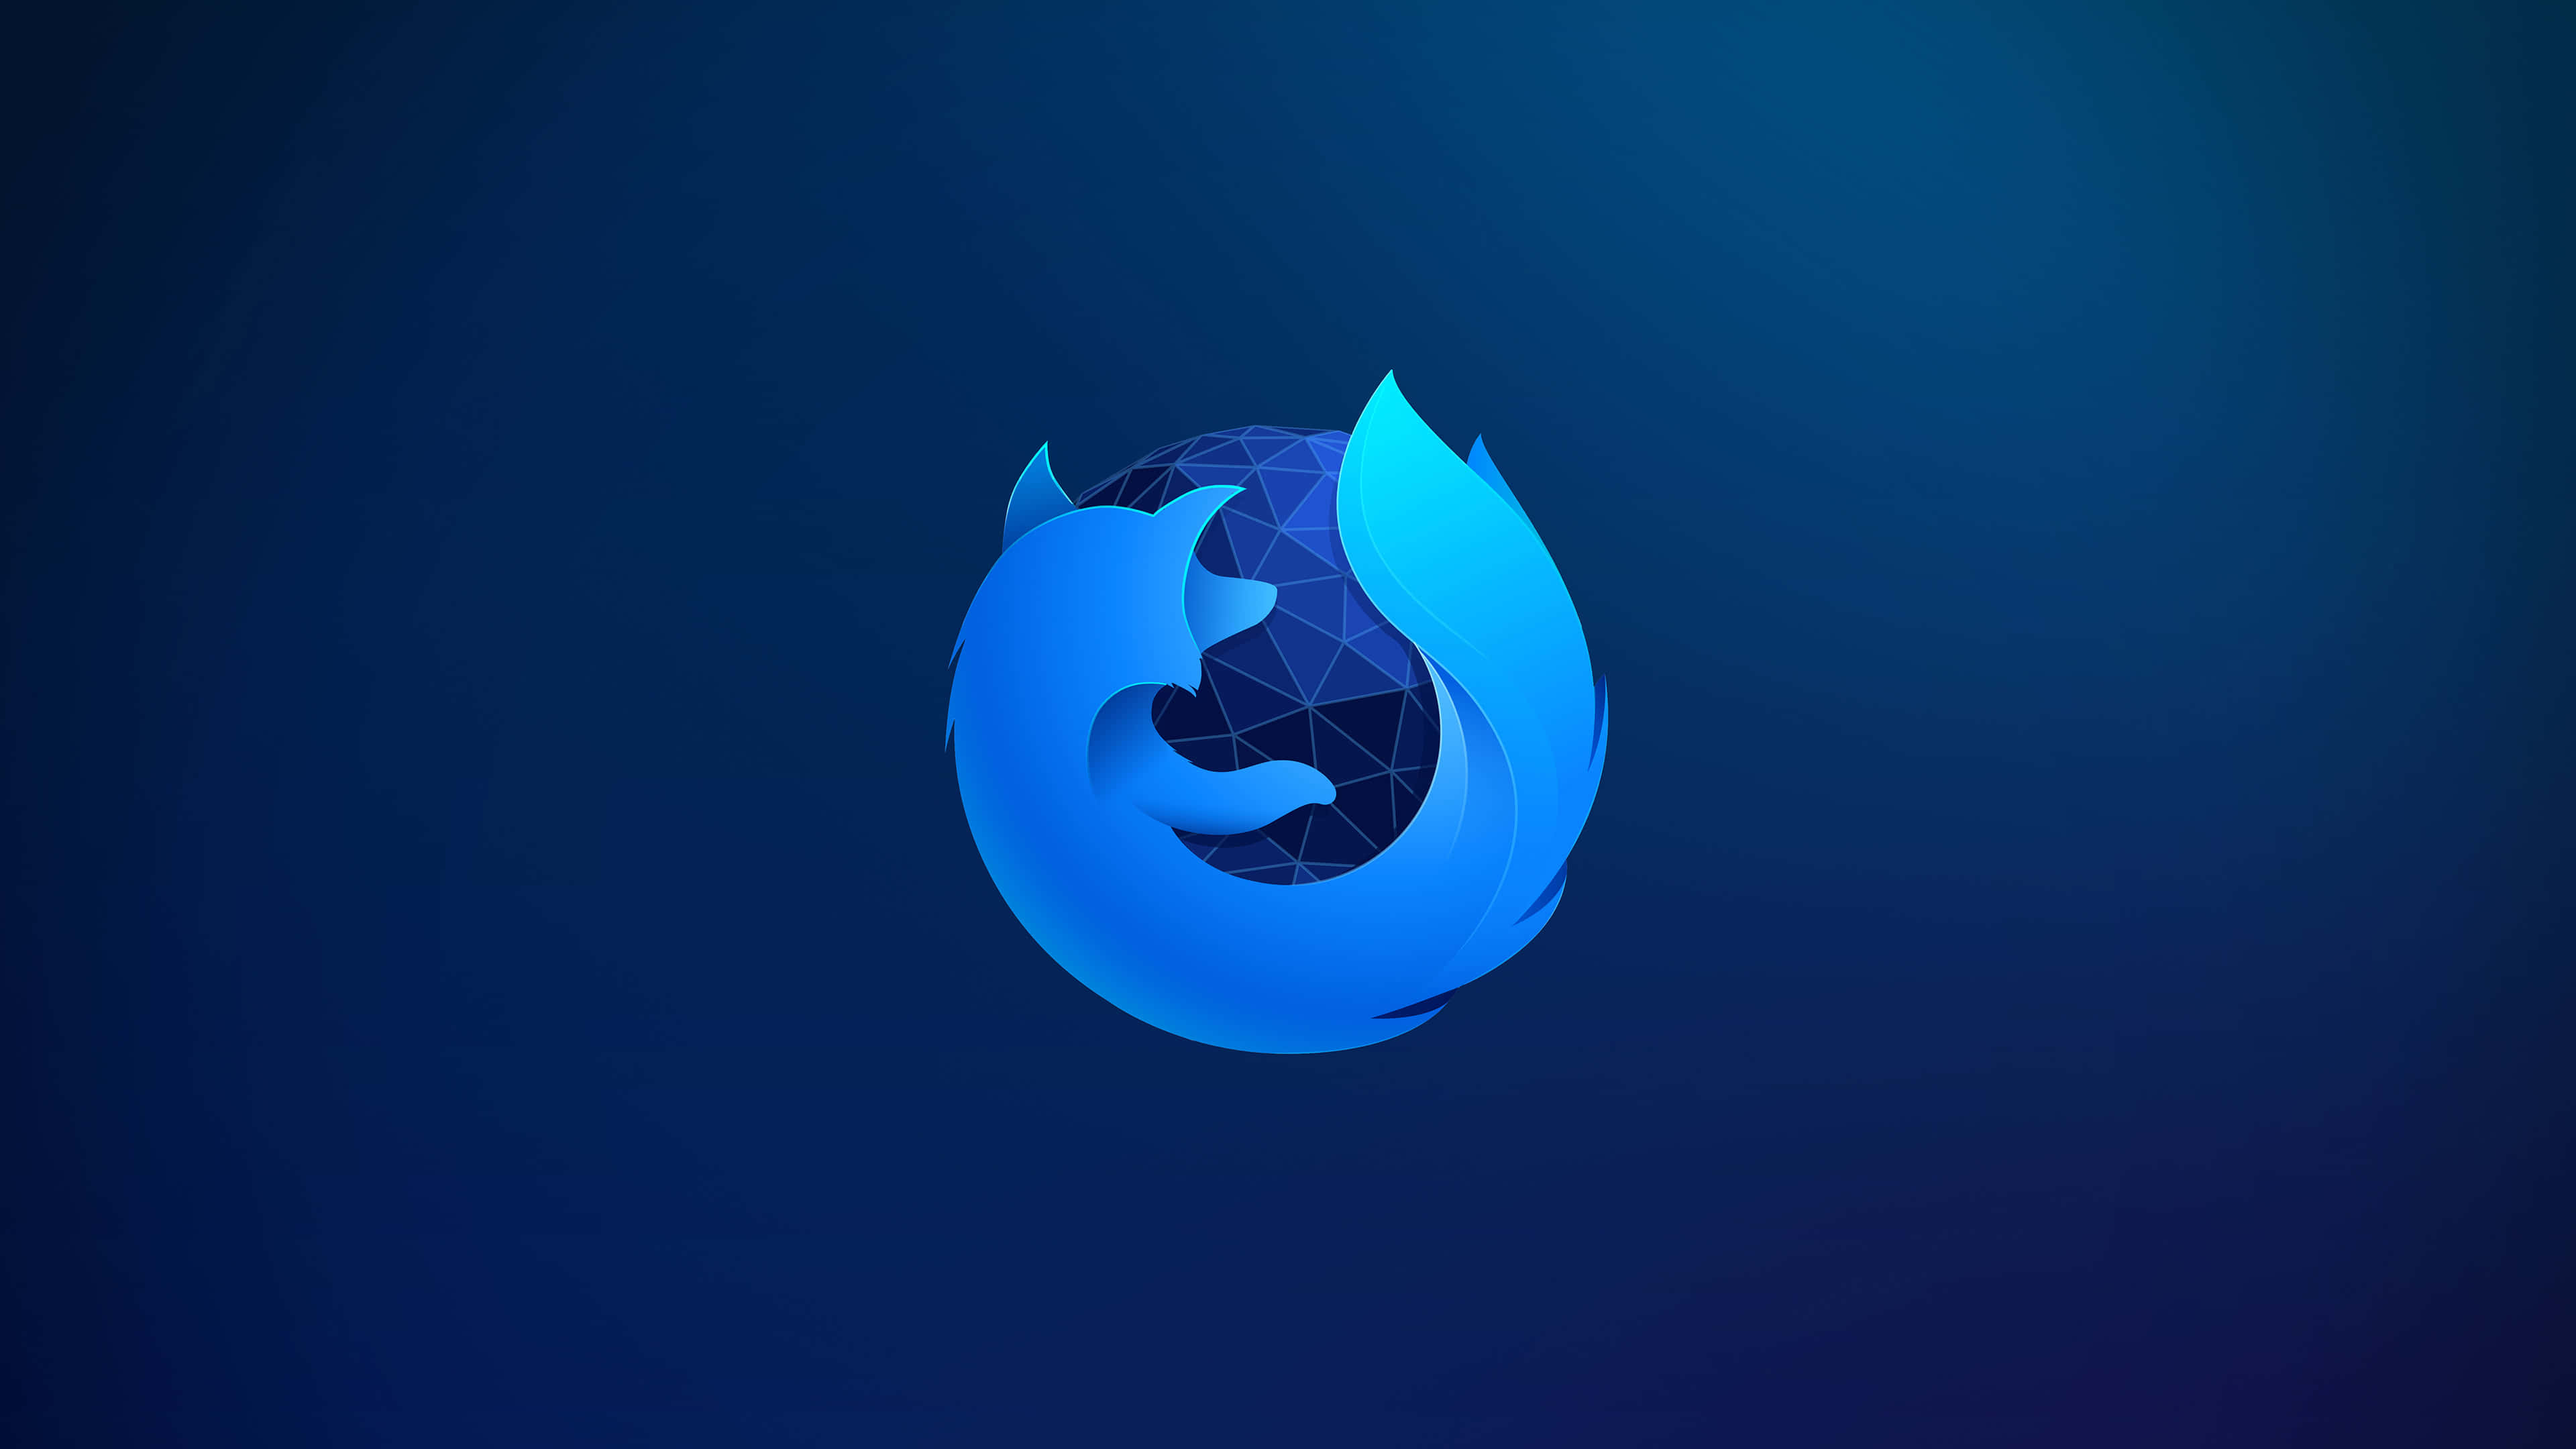 Firefox logo blue uhd 4k wallpaper pixelz - Ultra 4k background images ...